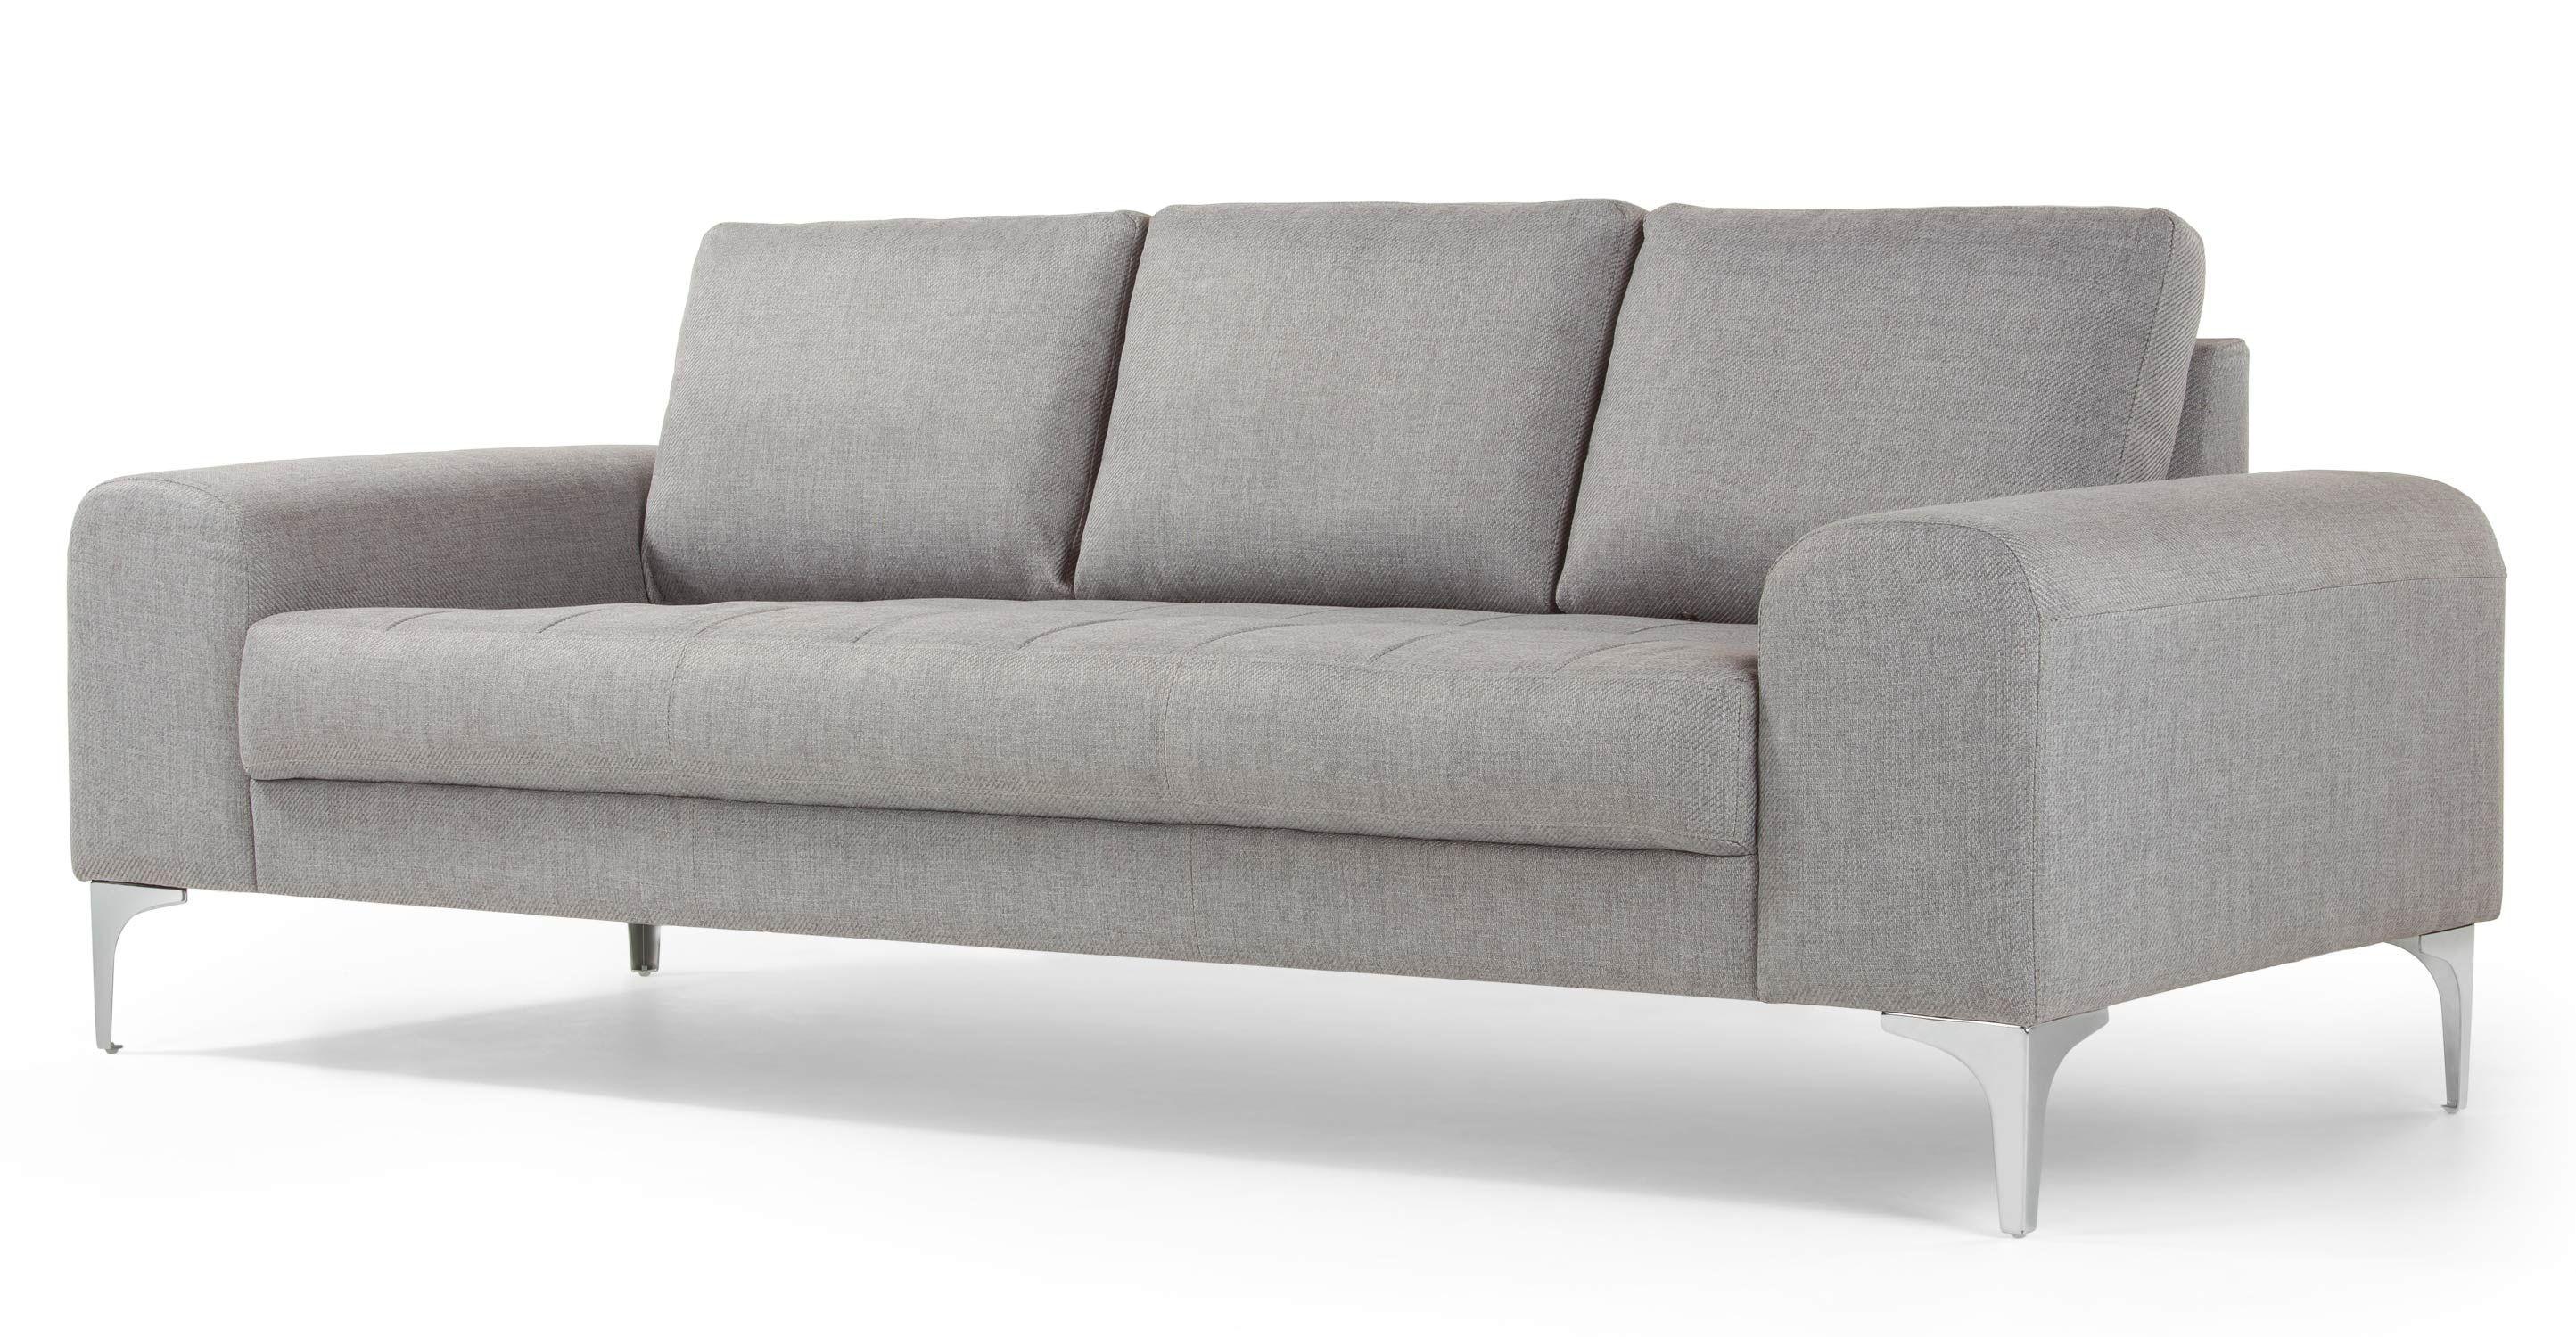 Vittorio 3 Seater Sofa Pearl Grey 3 Seater Sofa Seater Sofa Grey Sofa Bed